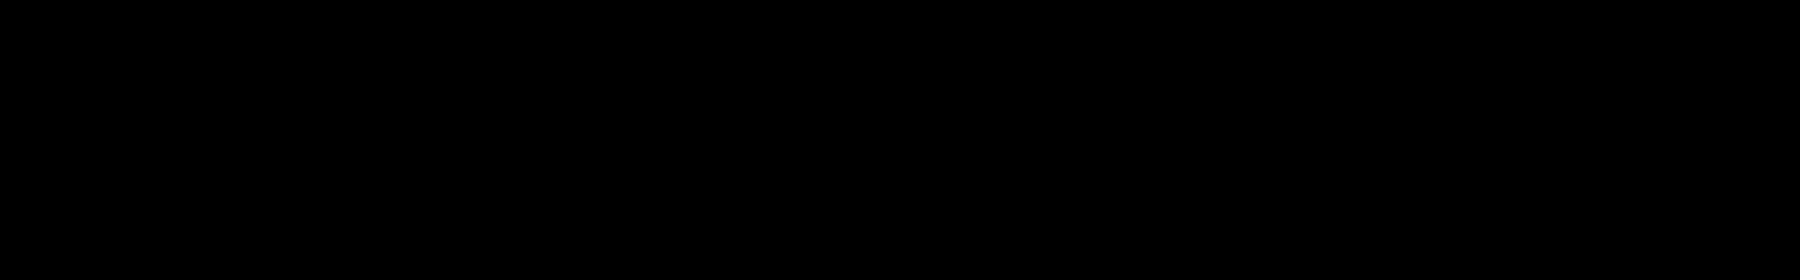 Neon Trap audio waveform